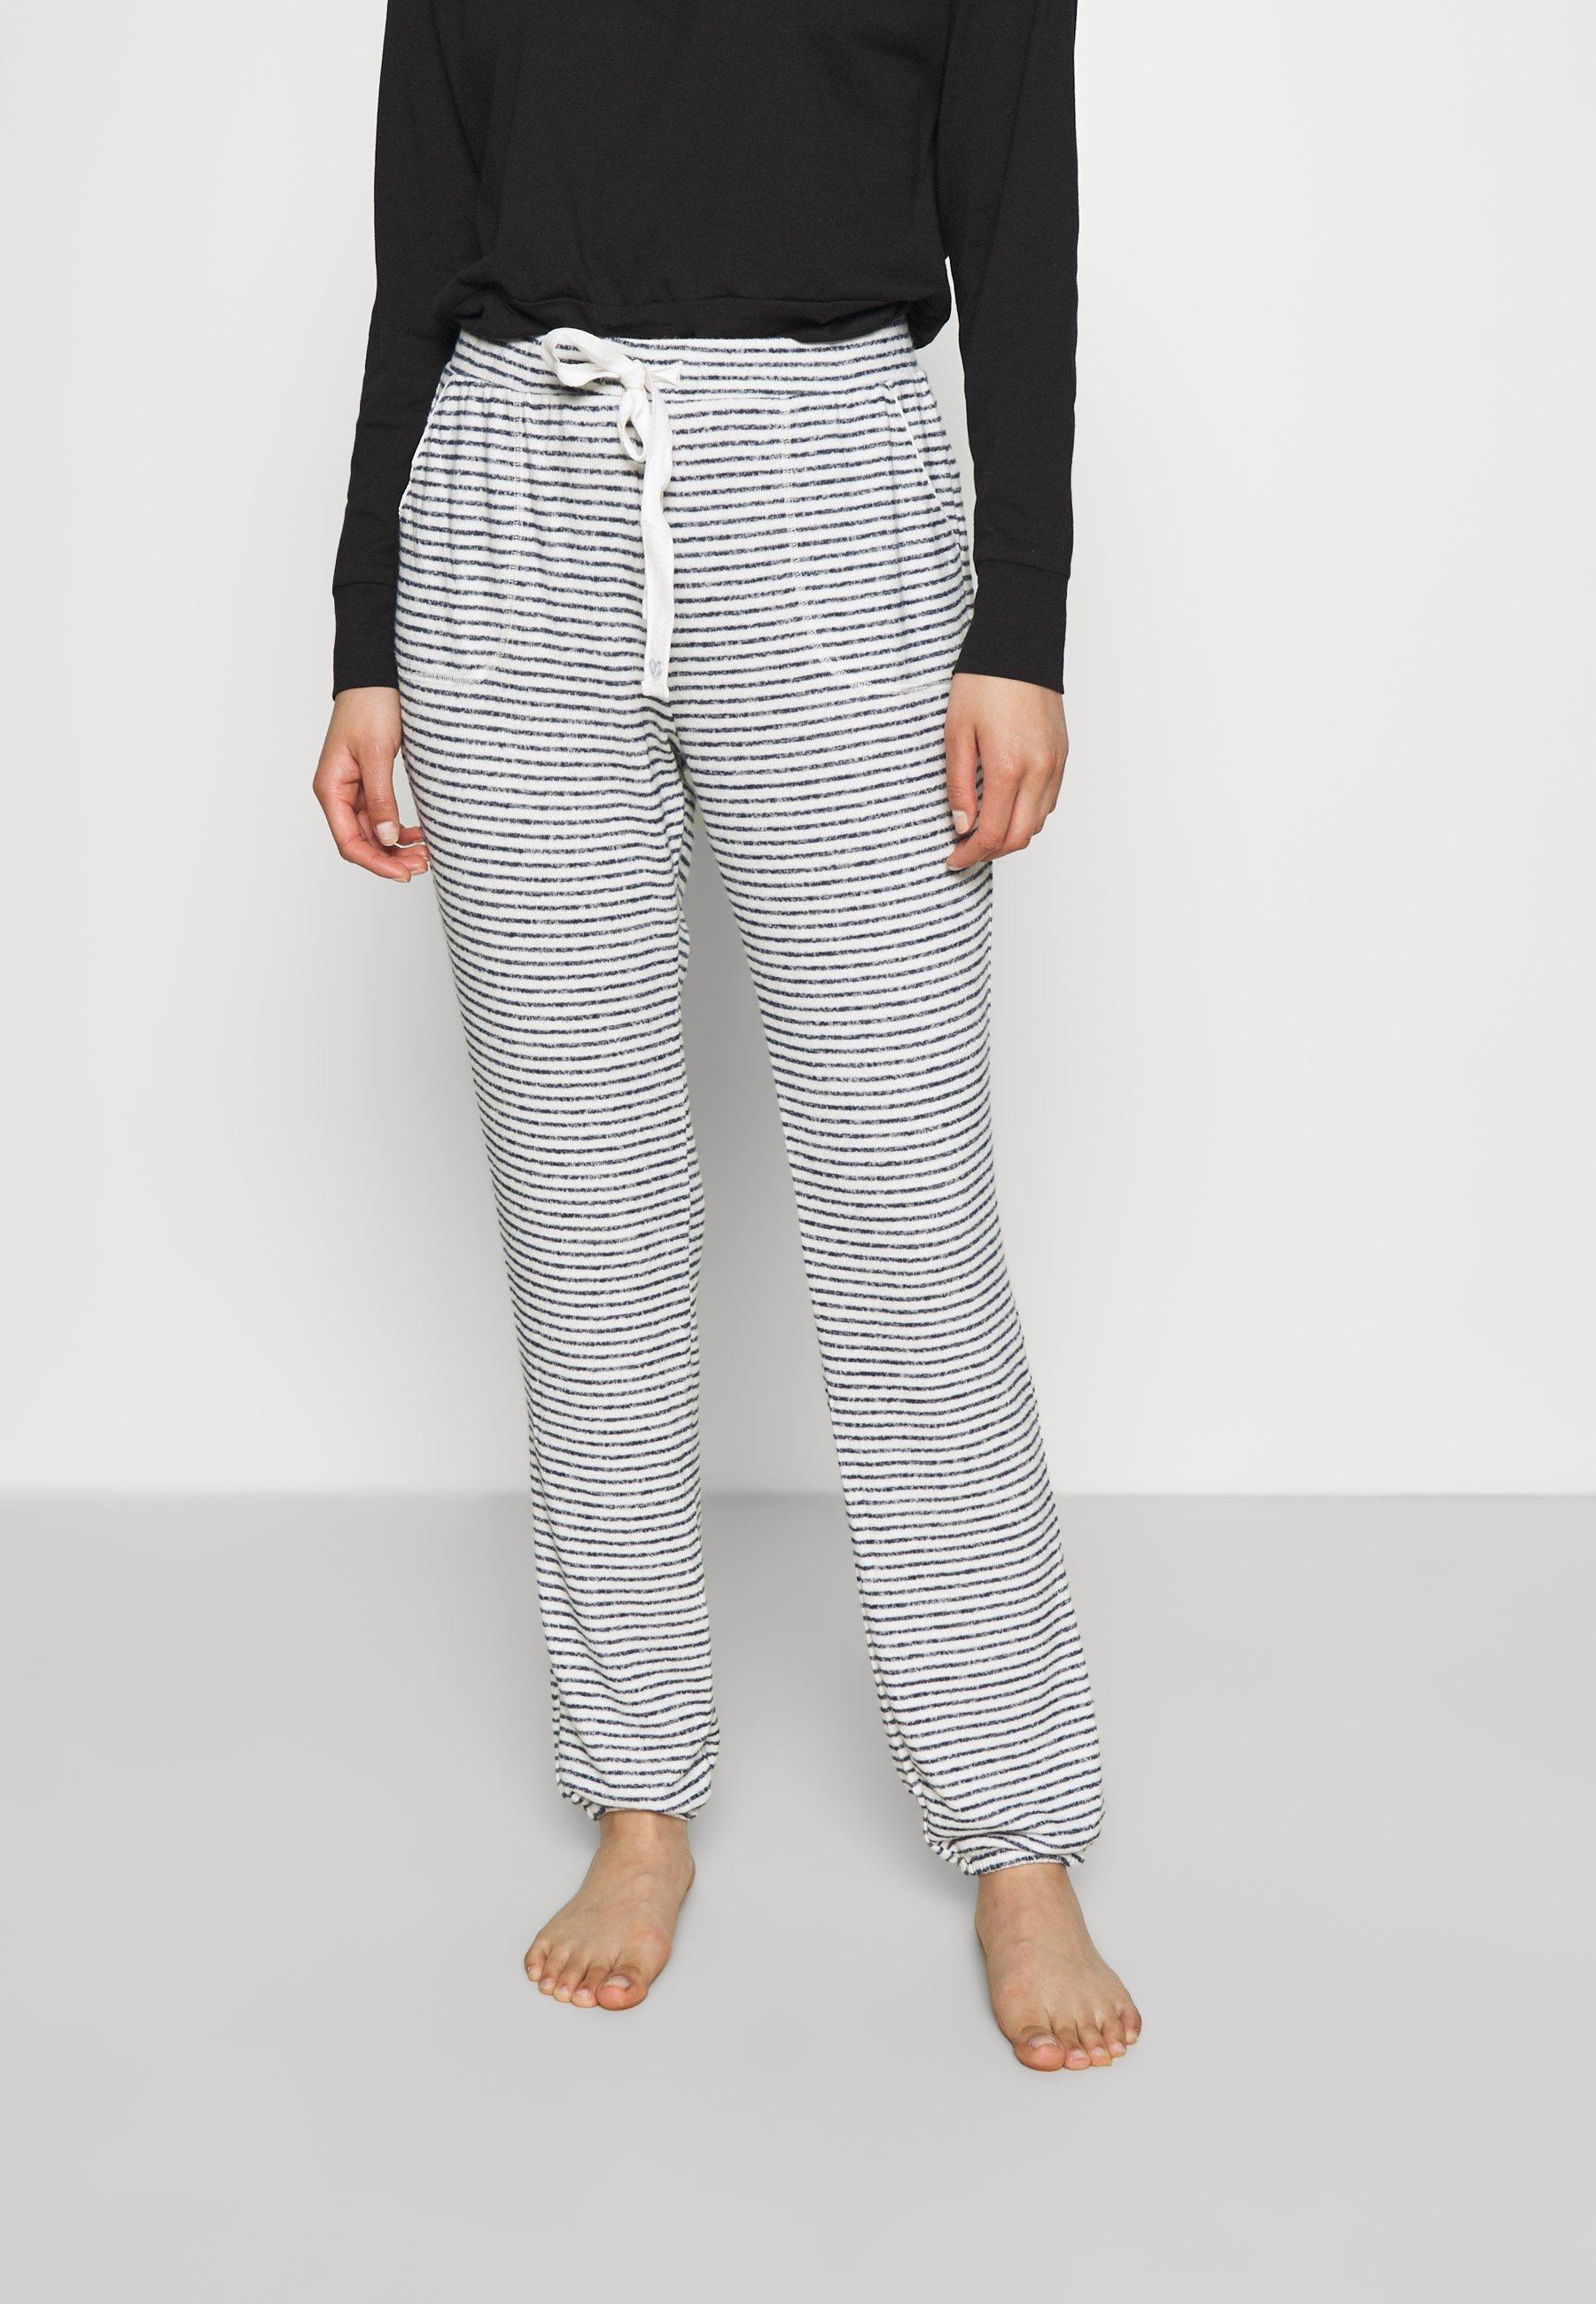 Women PANT BRUSHED JERSEY STRIPE - Pyjama bottoms